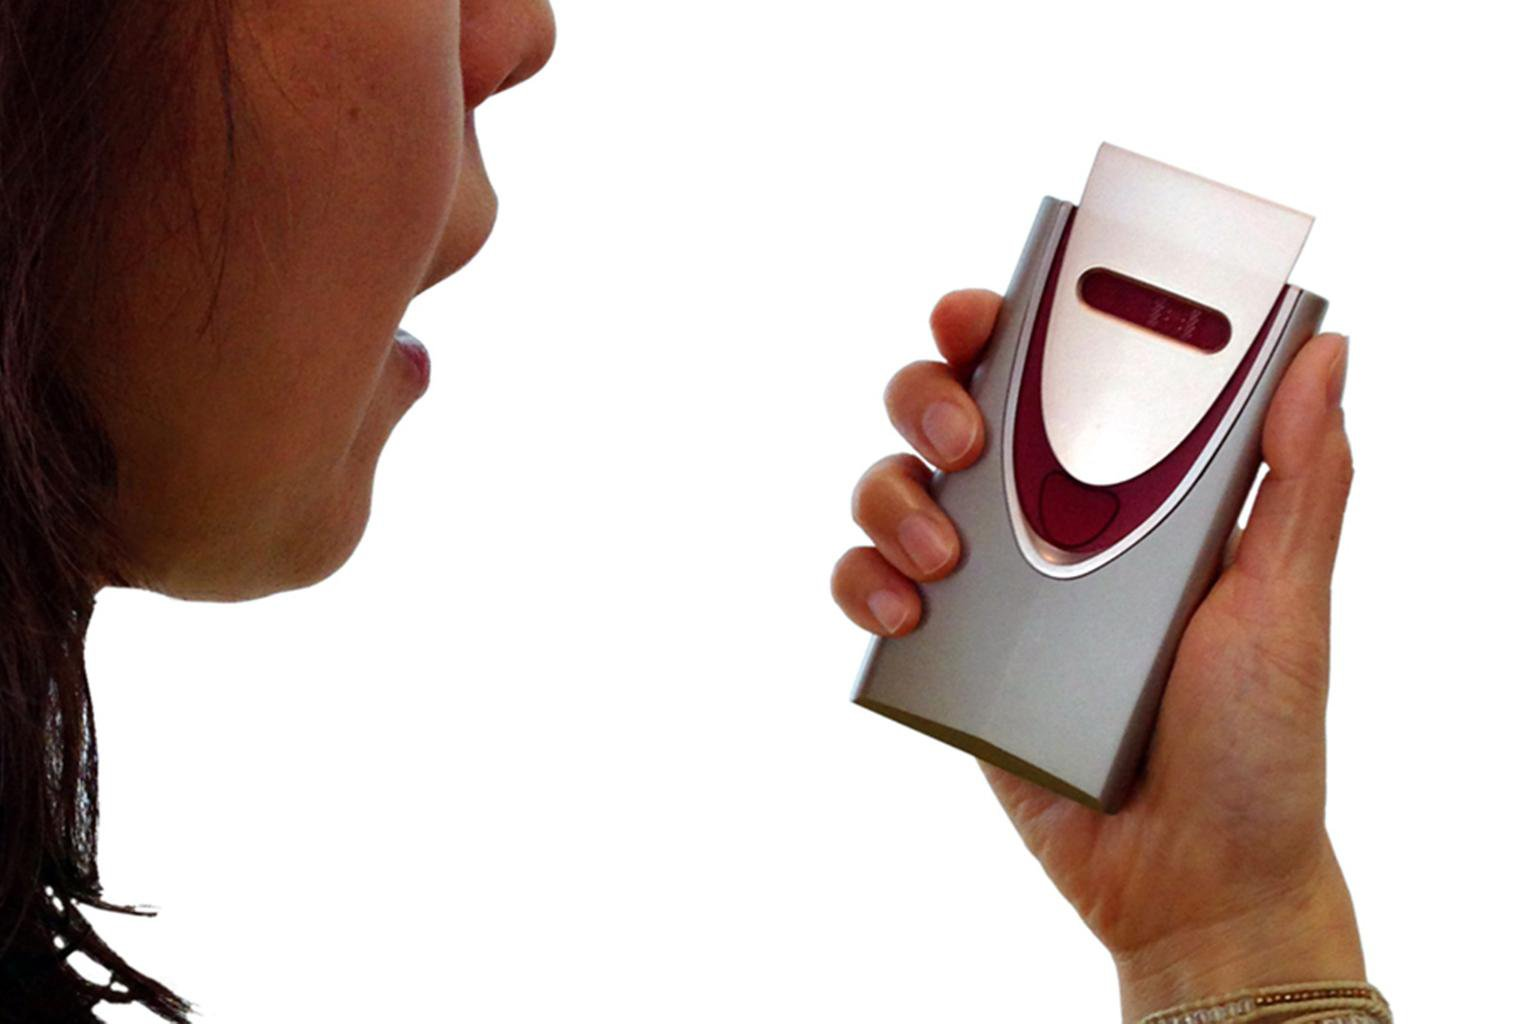 Honda reveals new portable breathalyser